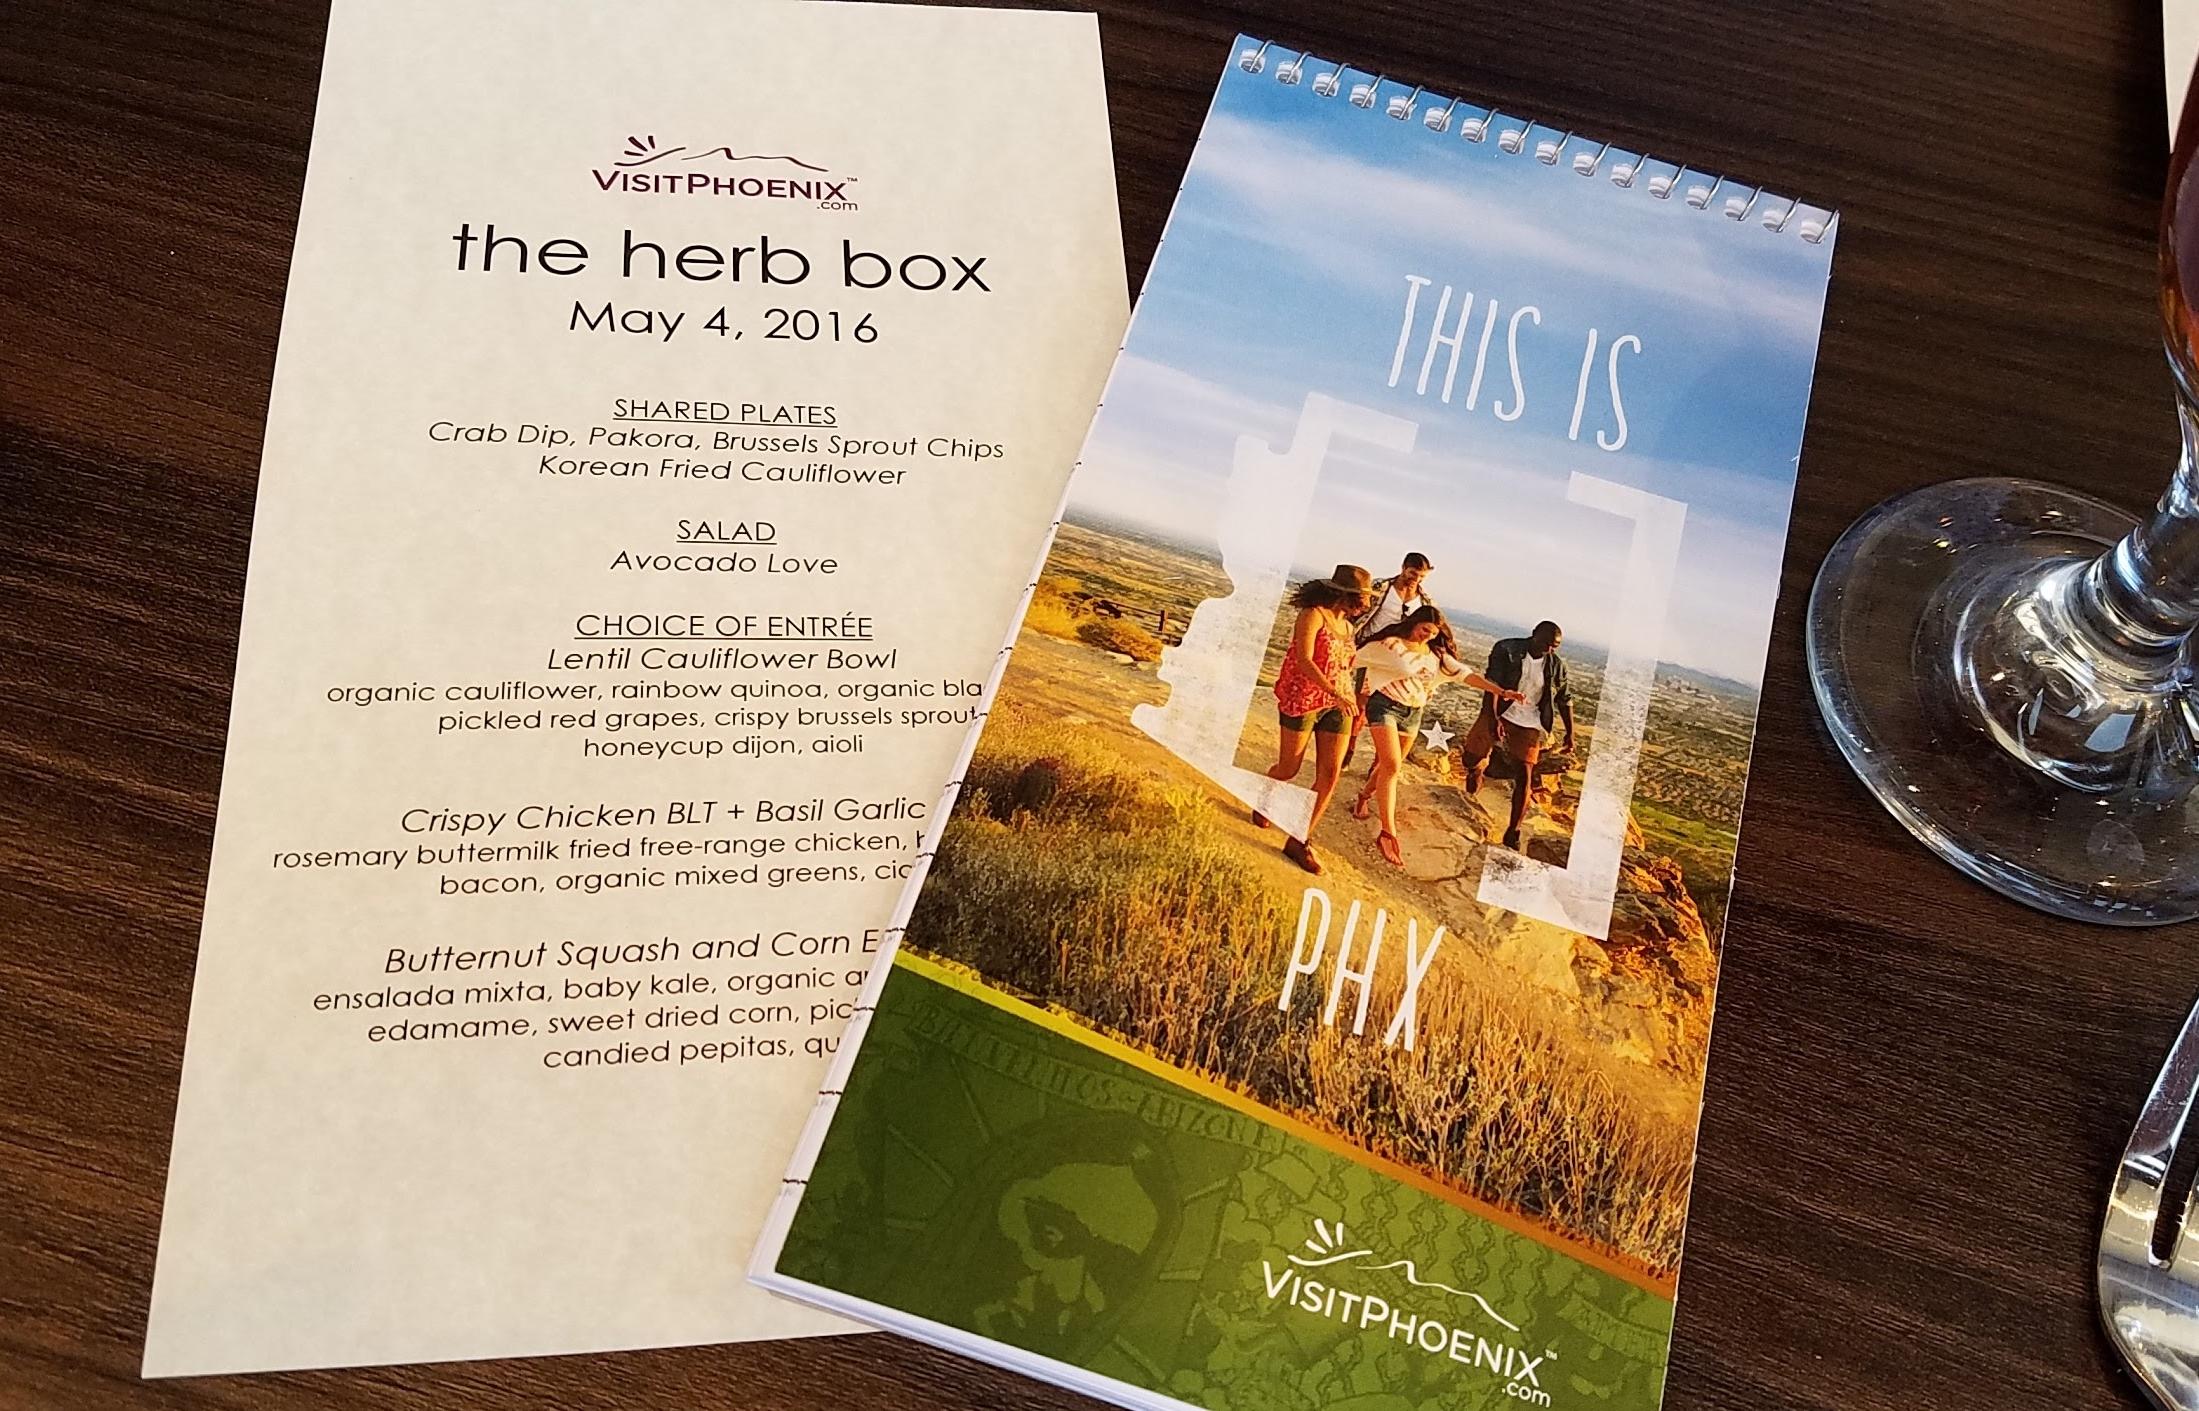 Herb Box Scottsdale